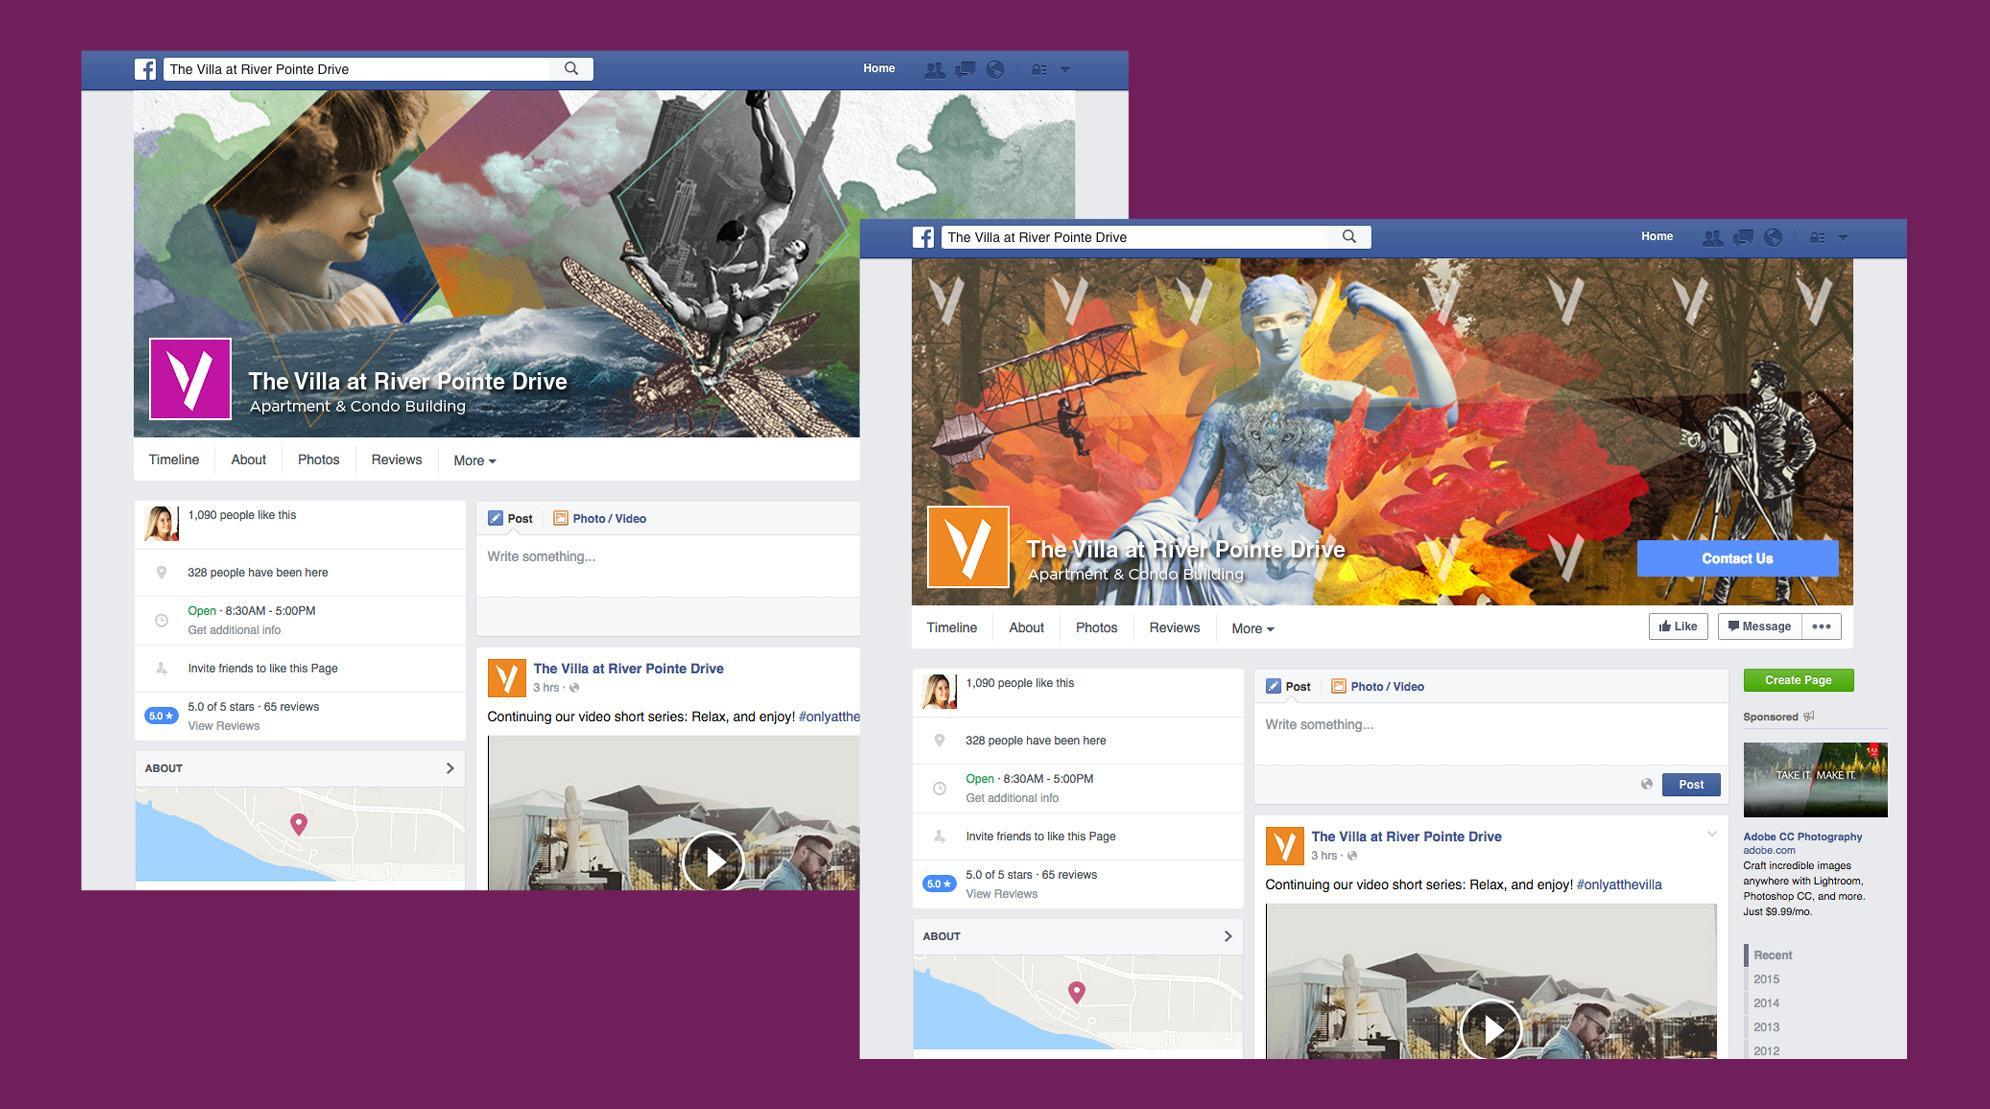 The Villa Social Media  - Facebook Page Screenshots